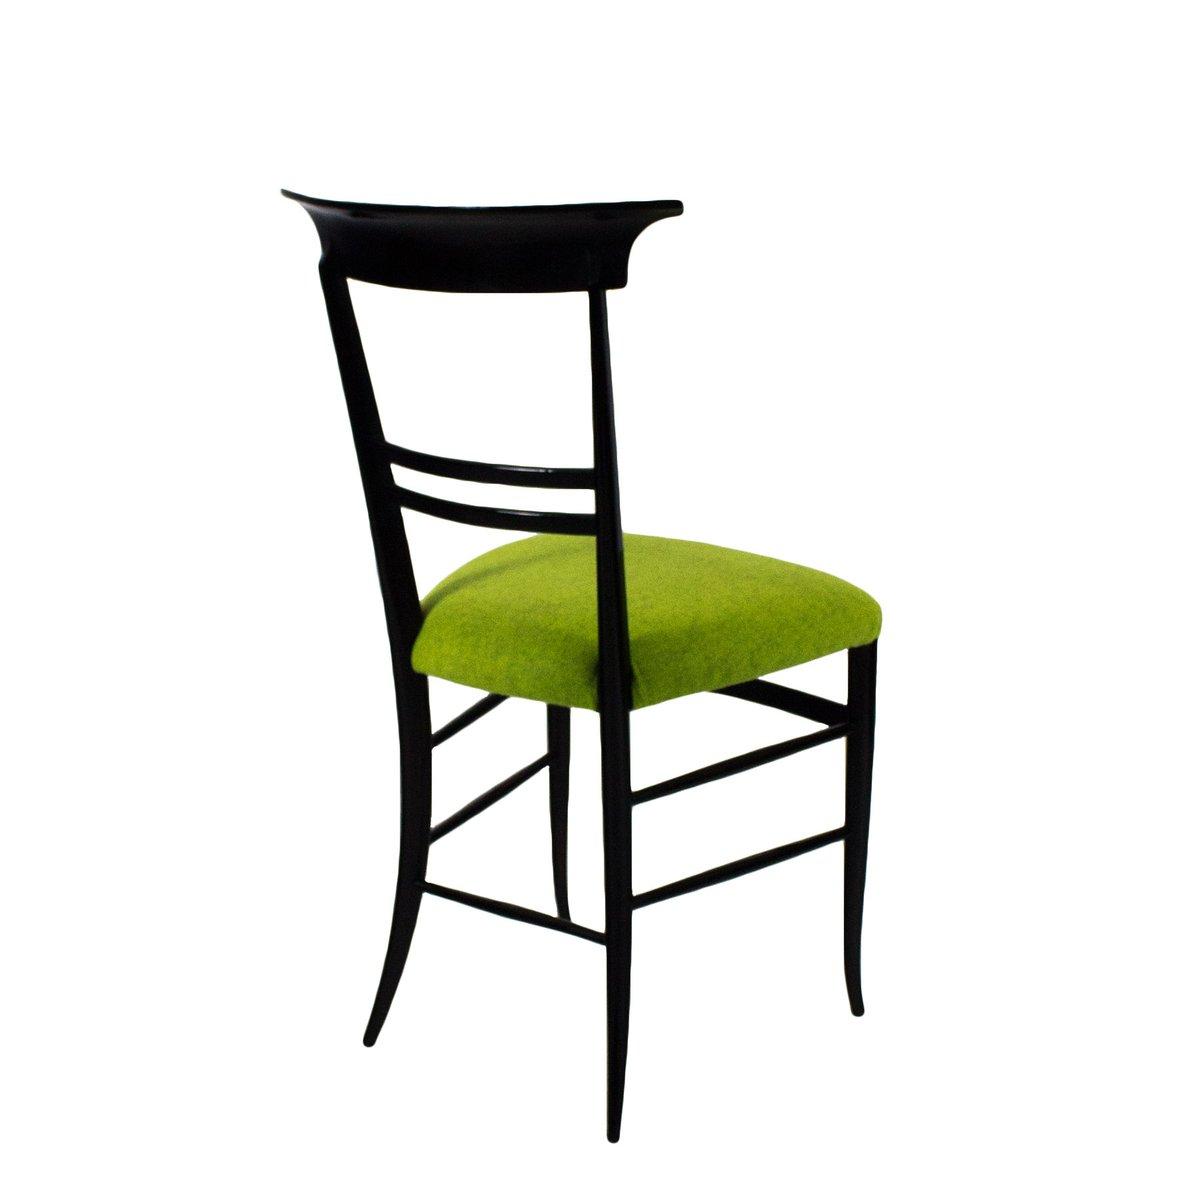 italienische st hle 1940er 2er set bei pamono kaufen. Black Bedroom Furniture Sets. Home Design Ideas